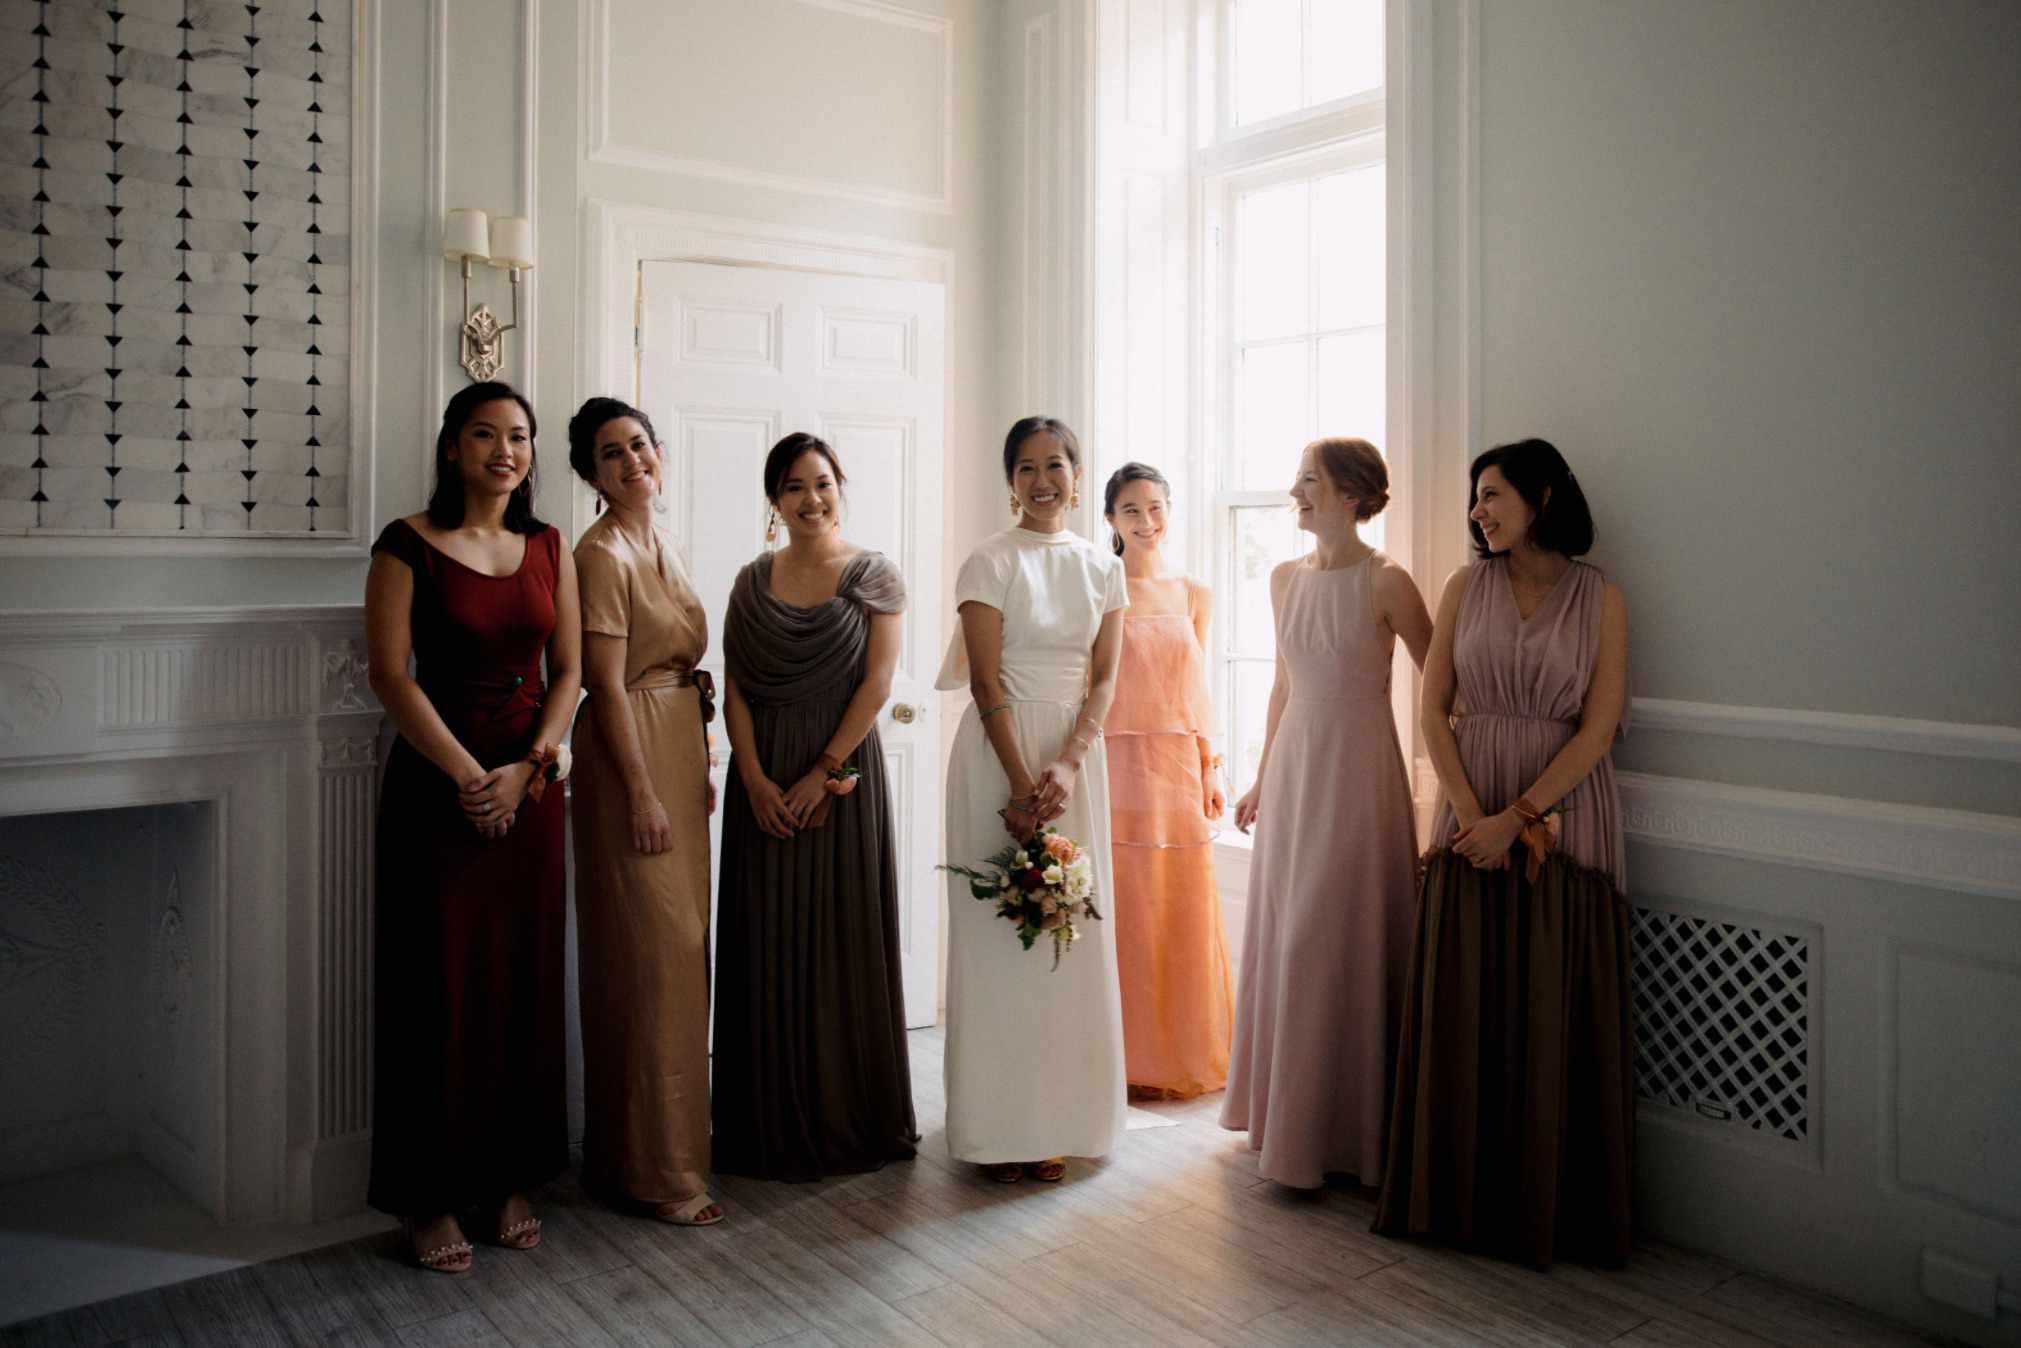 Bride with bridesmaids in smokey neutrals